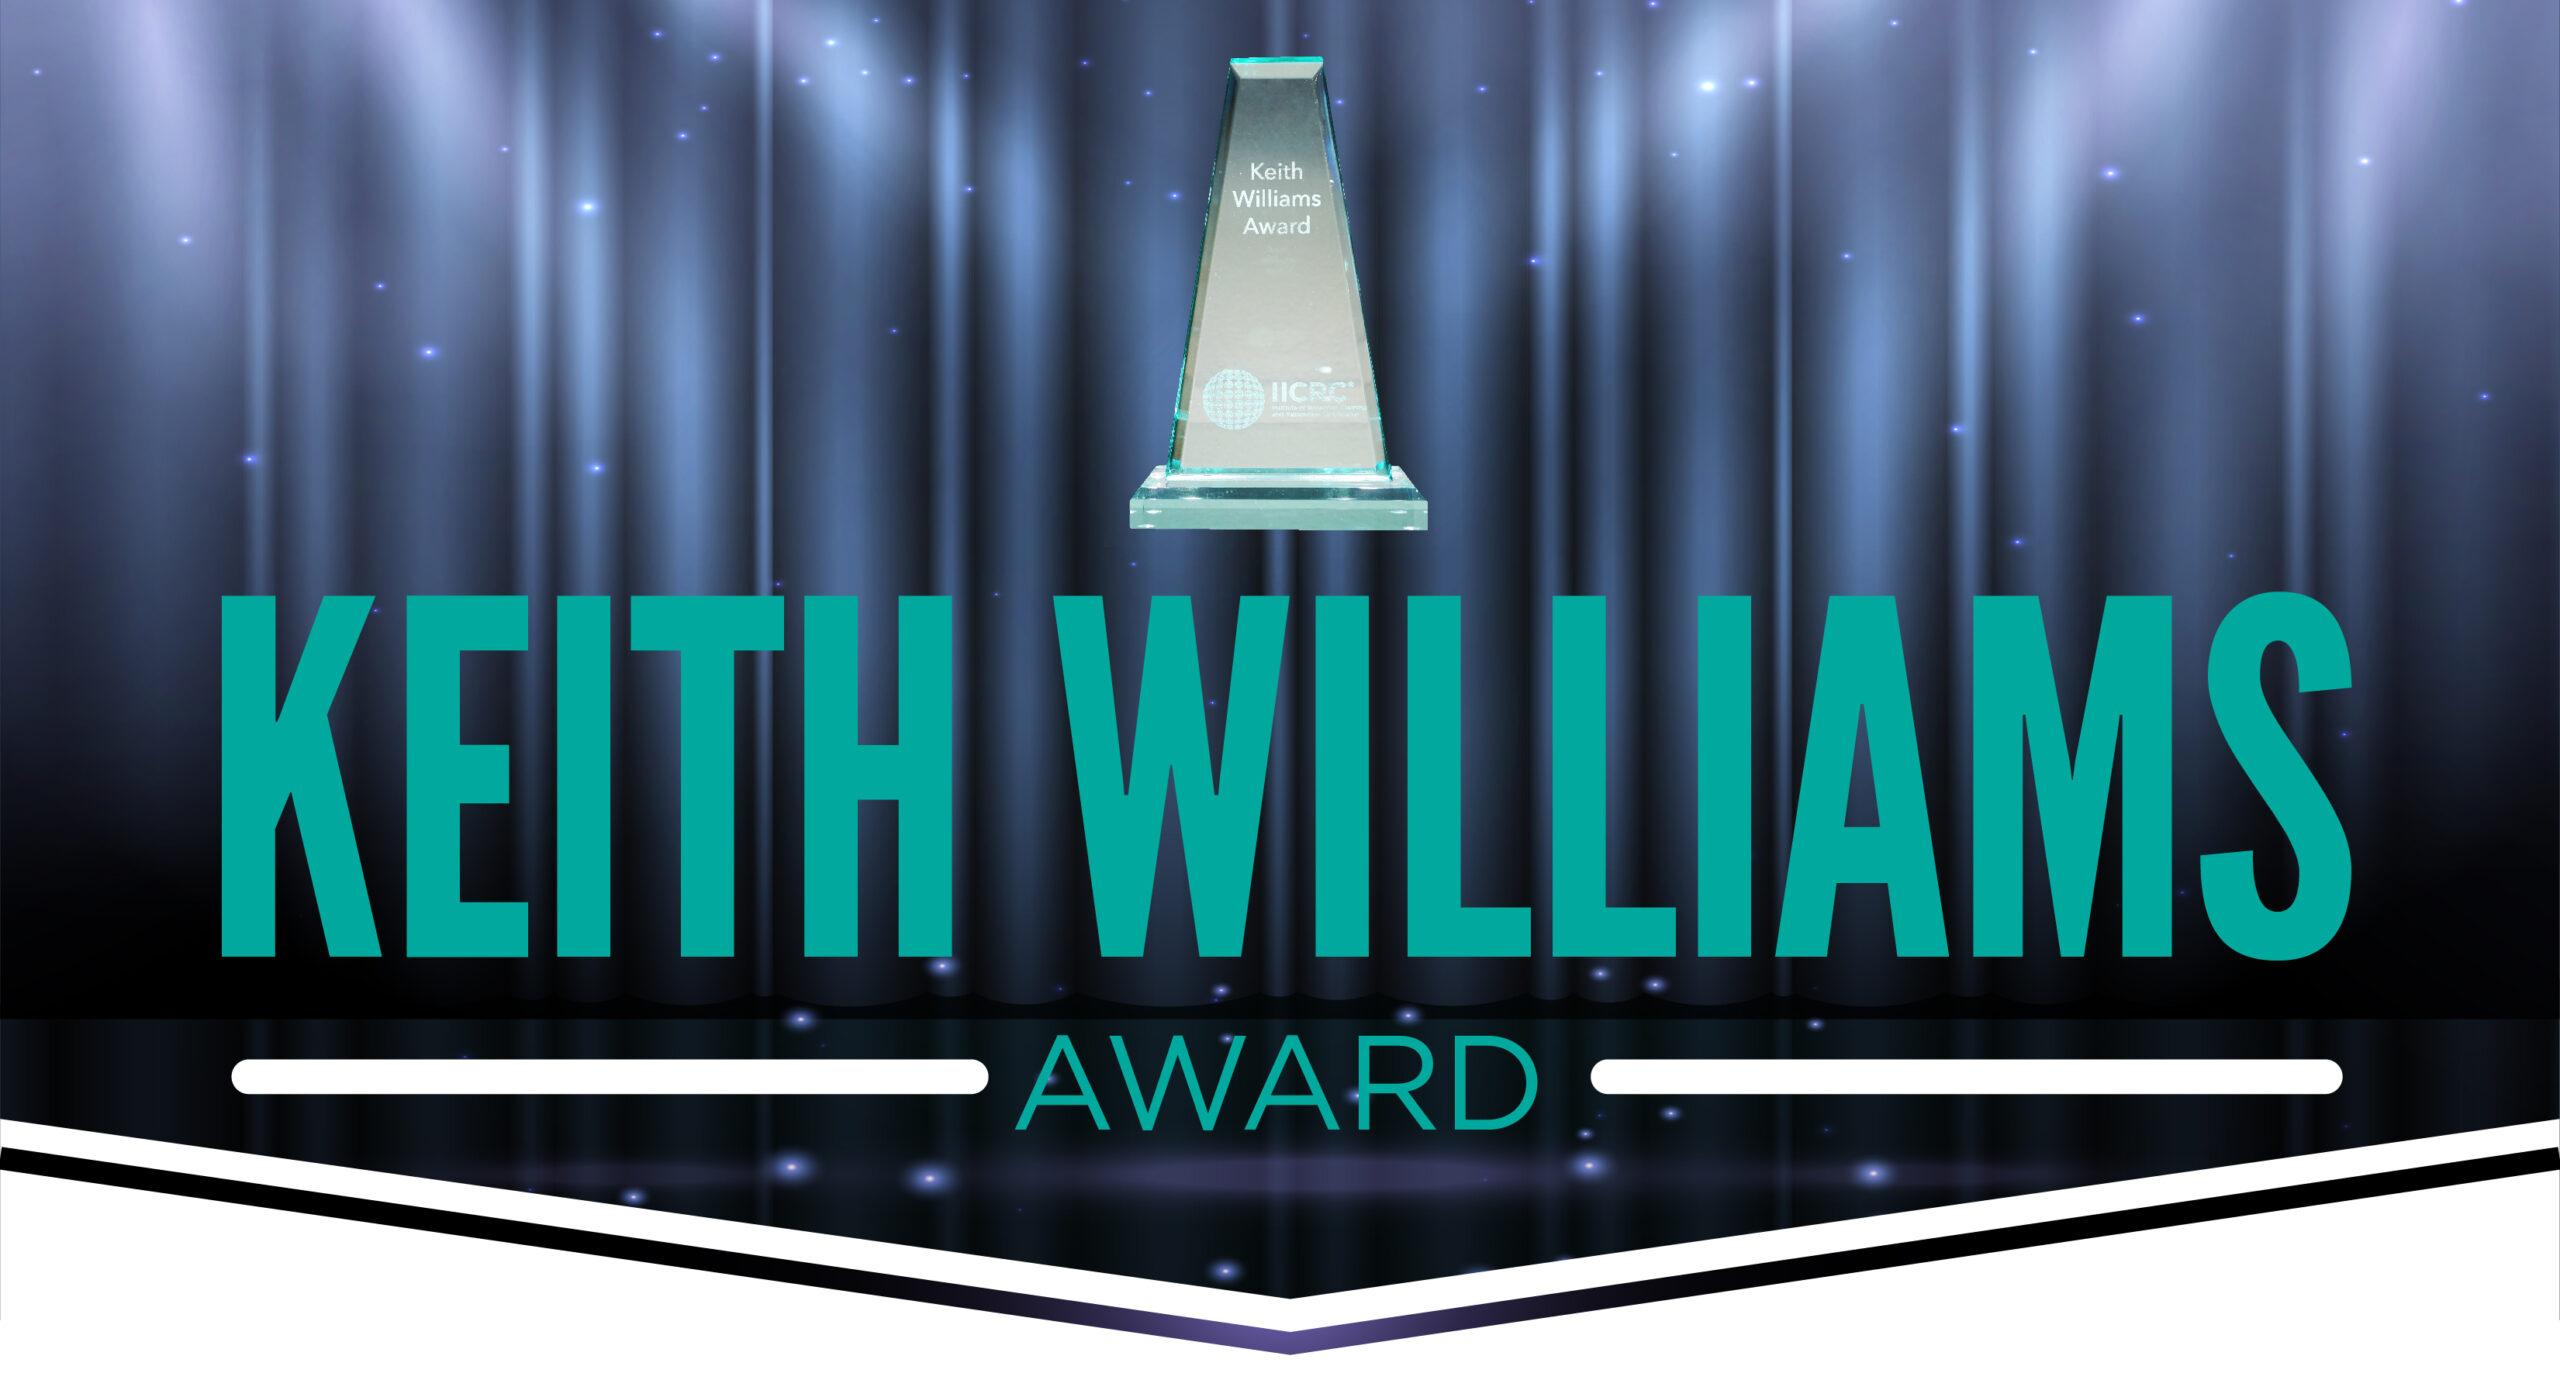 Keith Williams Award page header